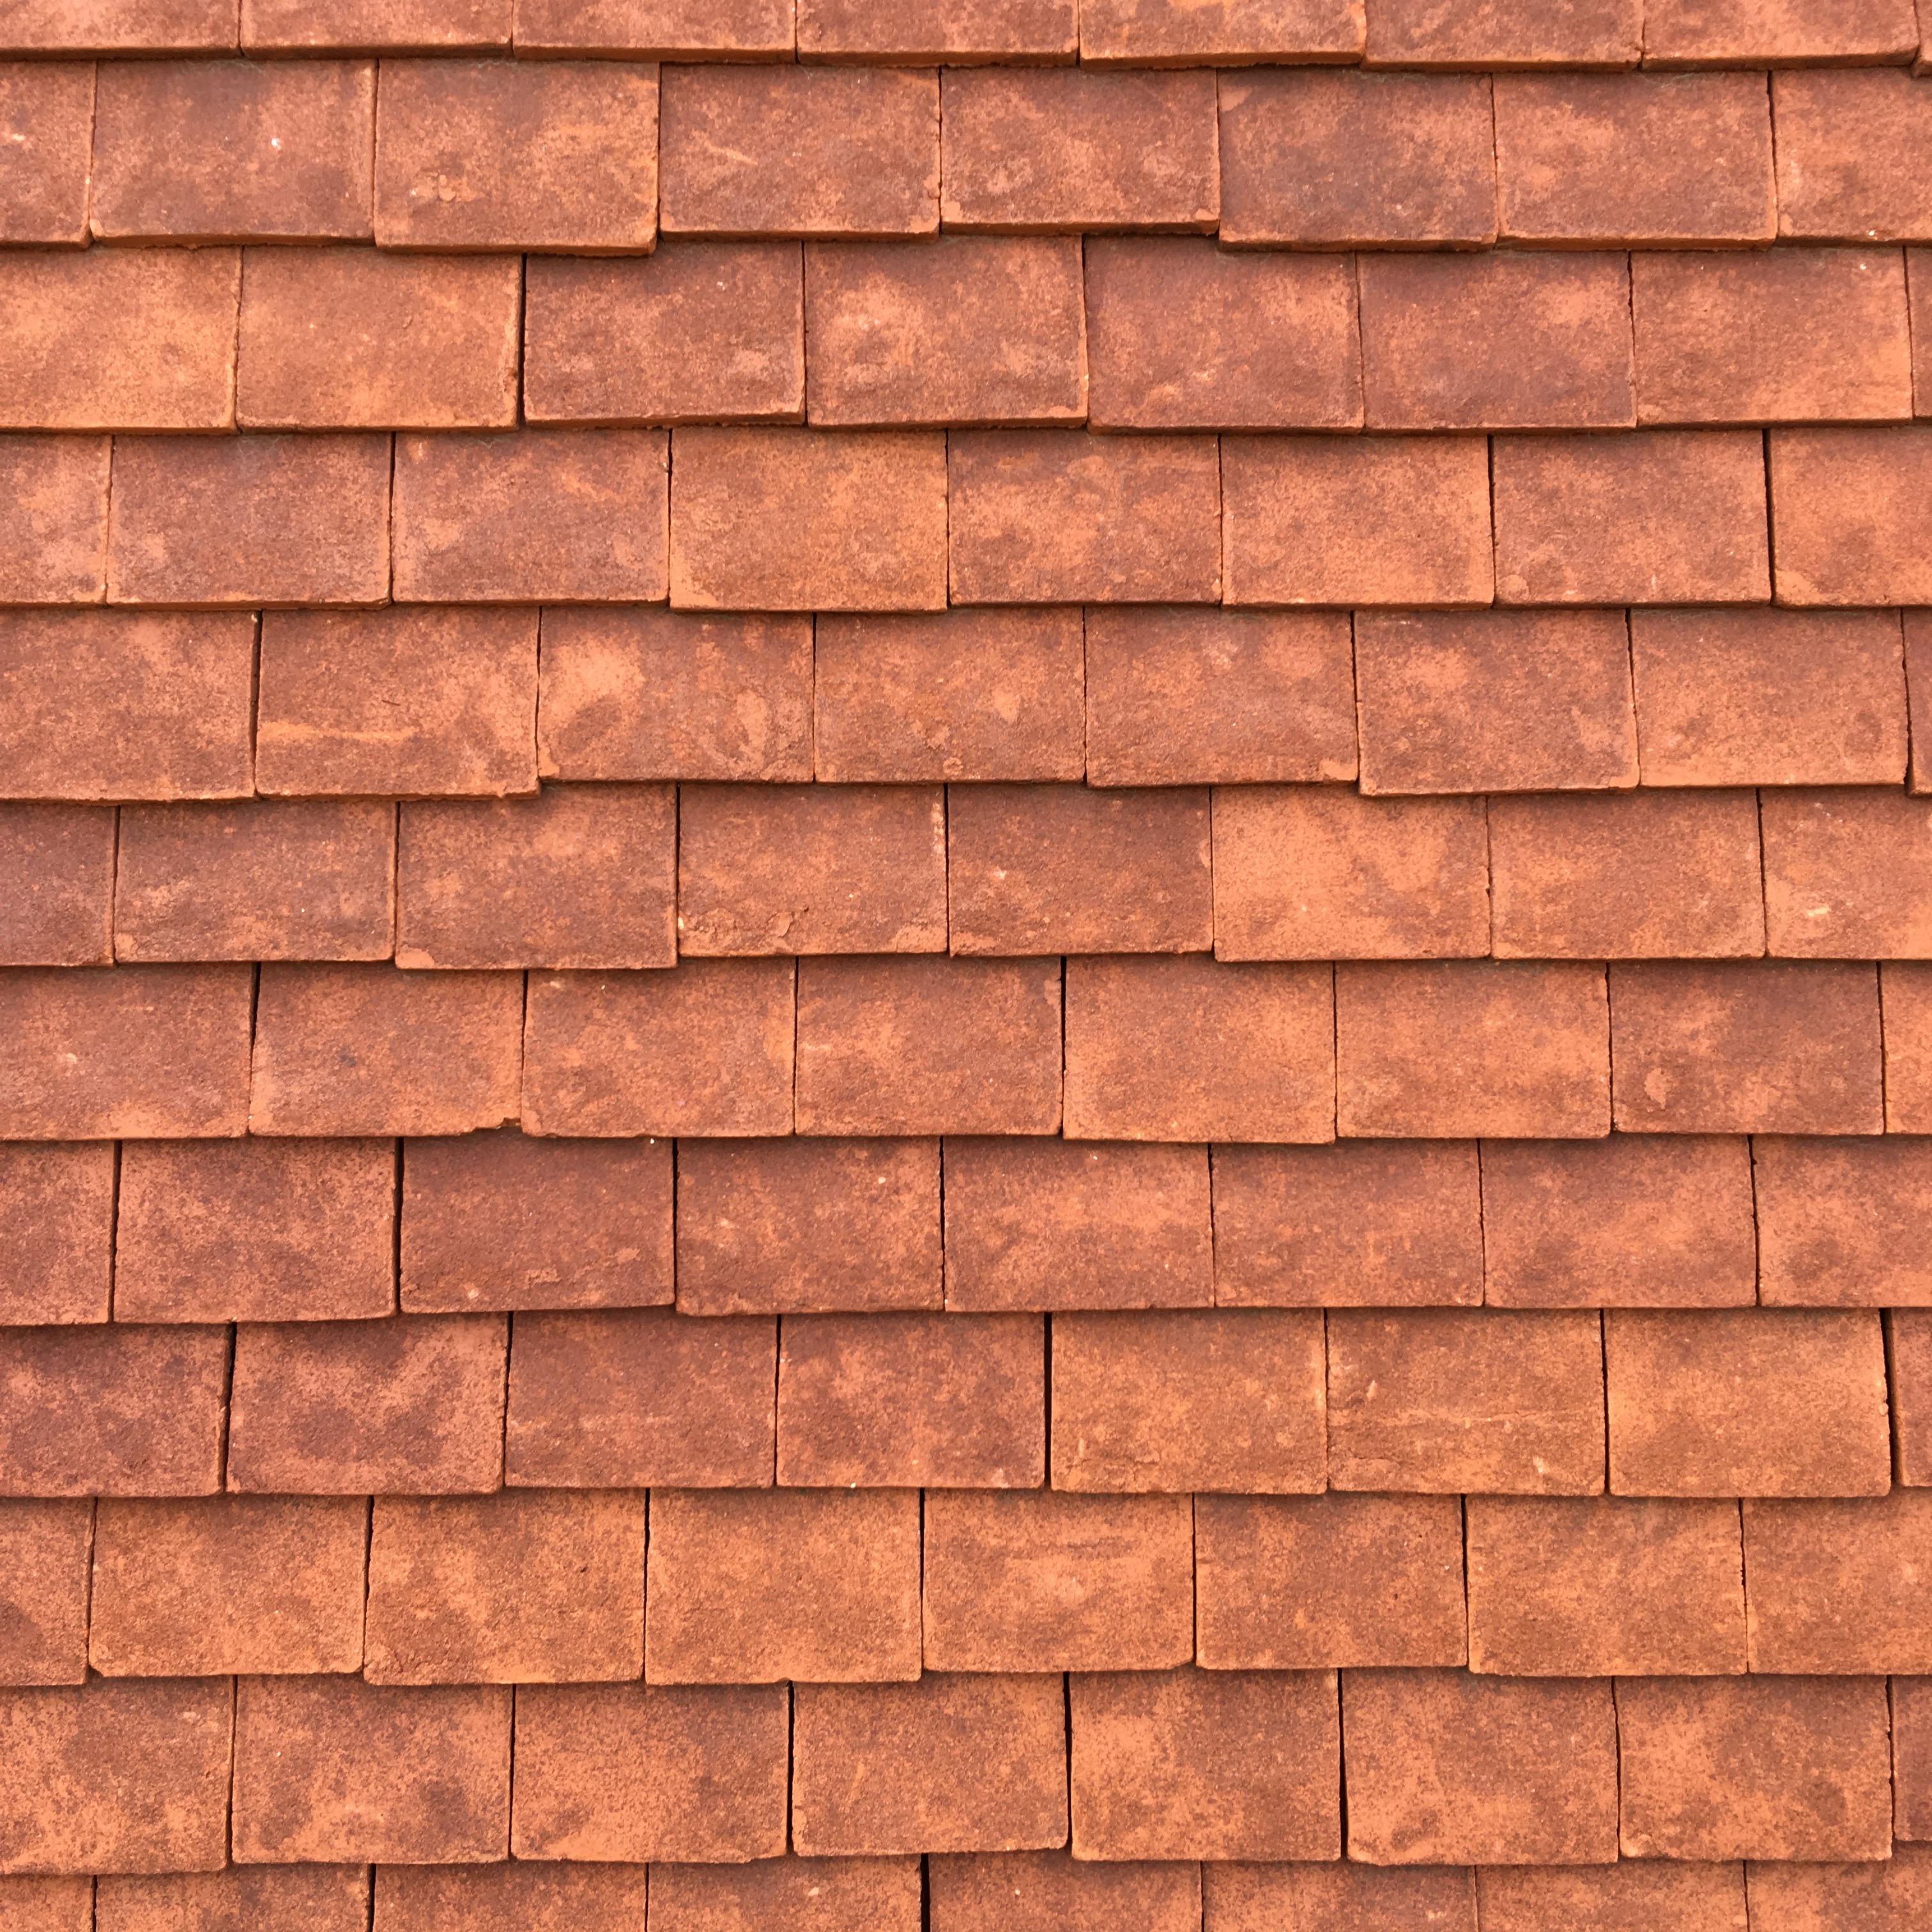 Hand made Terracotta roof tiles - MICHELLE OGUNDEHIN